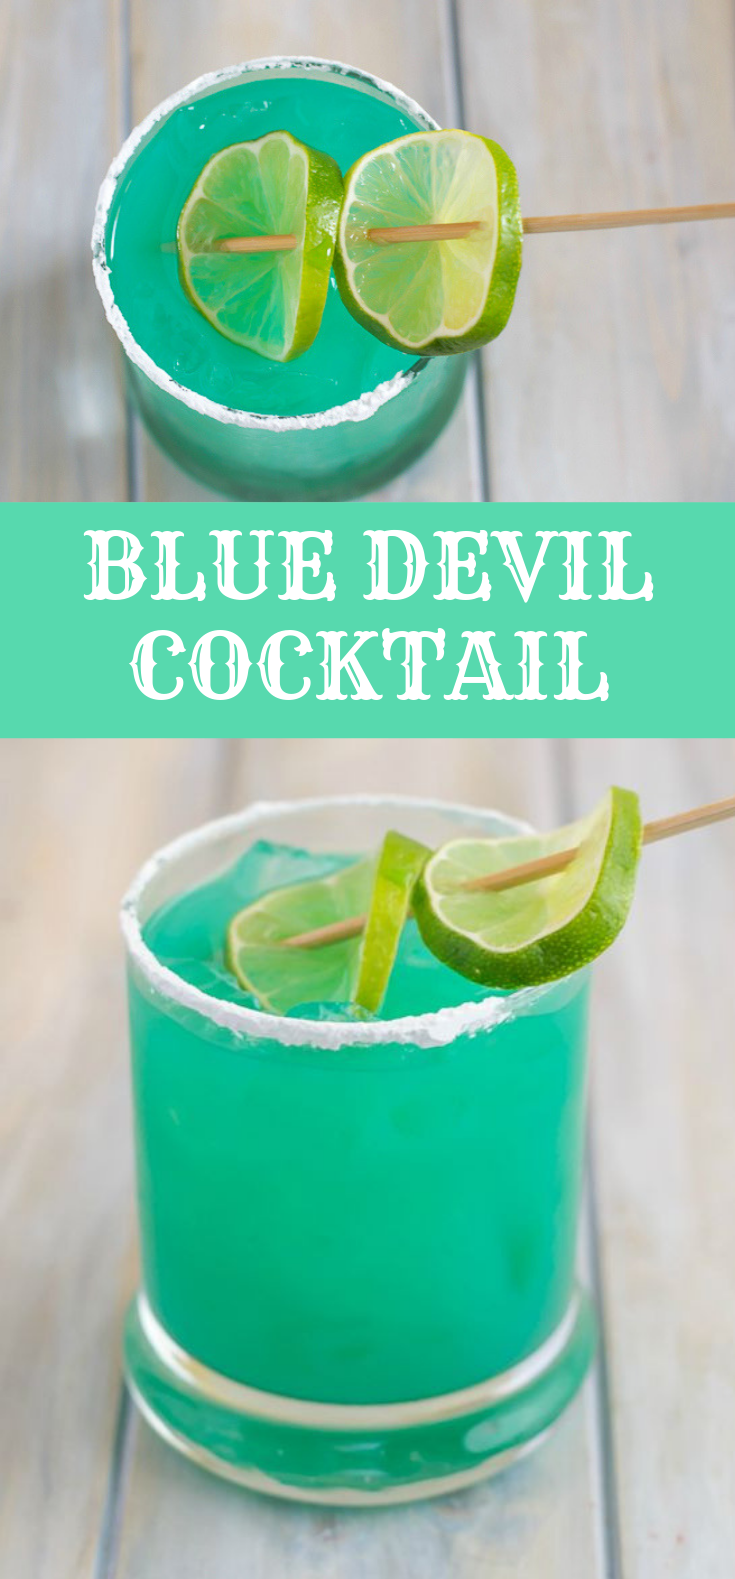 Photo of BLUE DEVIL COCKTAIL RECIPE #Cocktail #Drinks